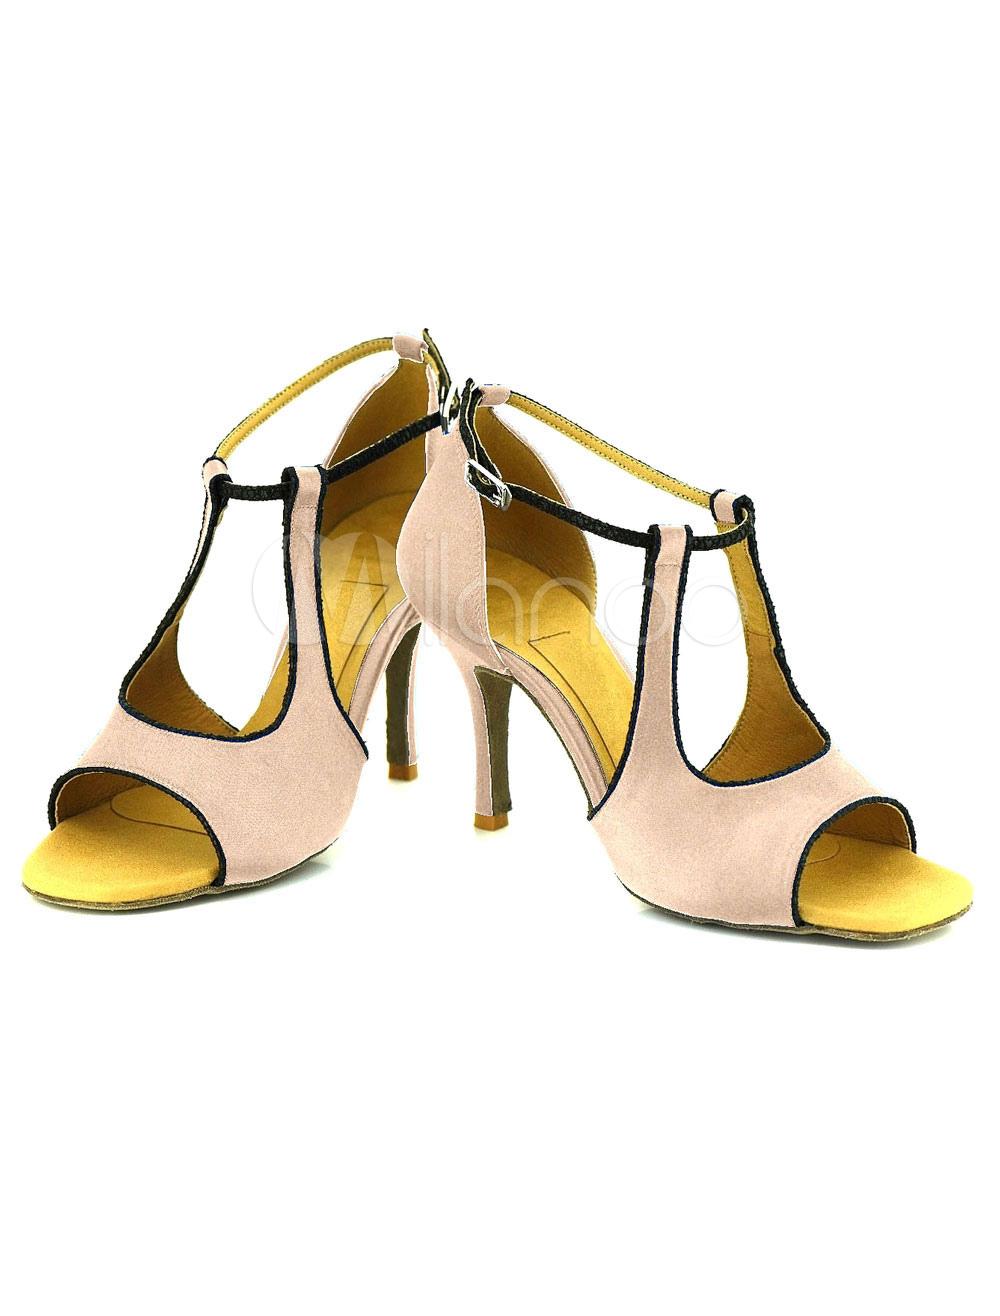 Ankle Strap Dance Shoes High Heel Women's Cut Out Open Toe Ballroom Dance Shoes